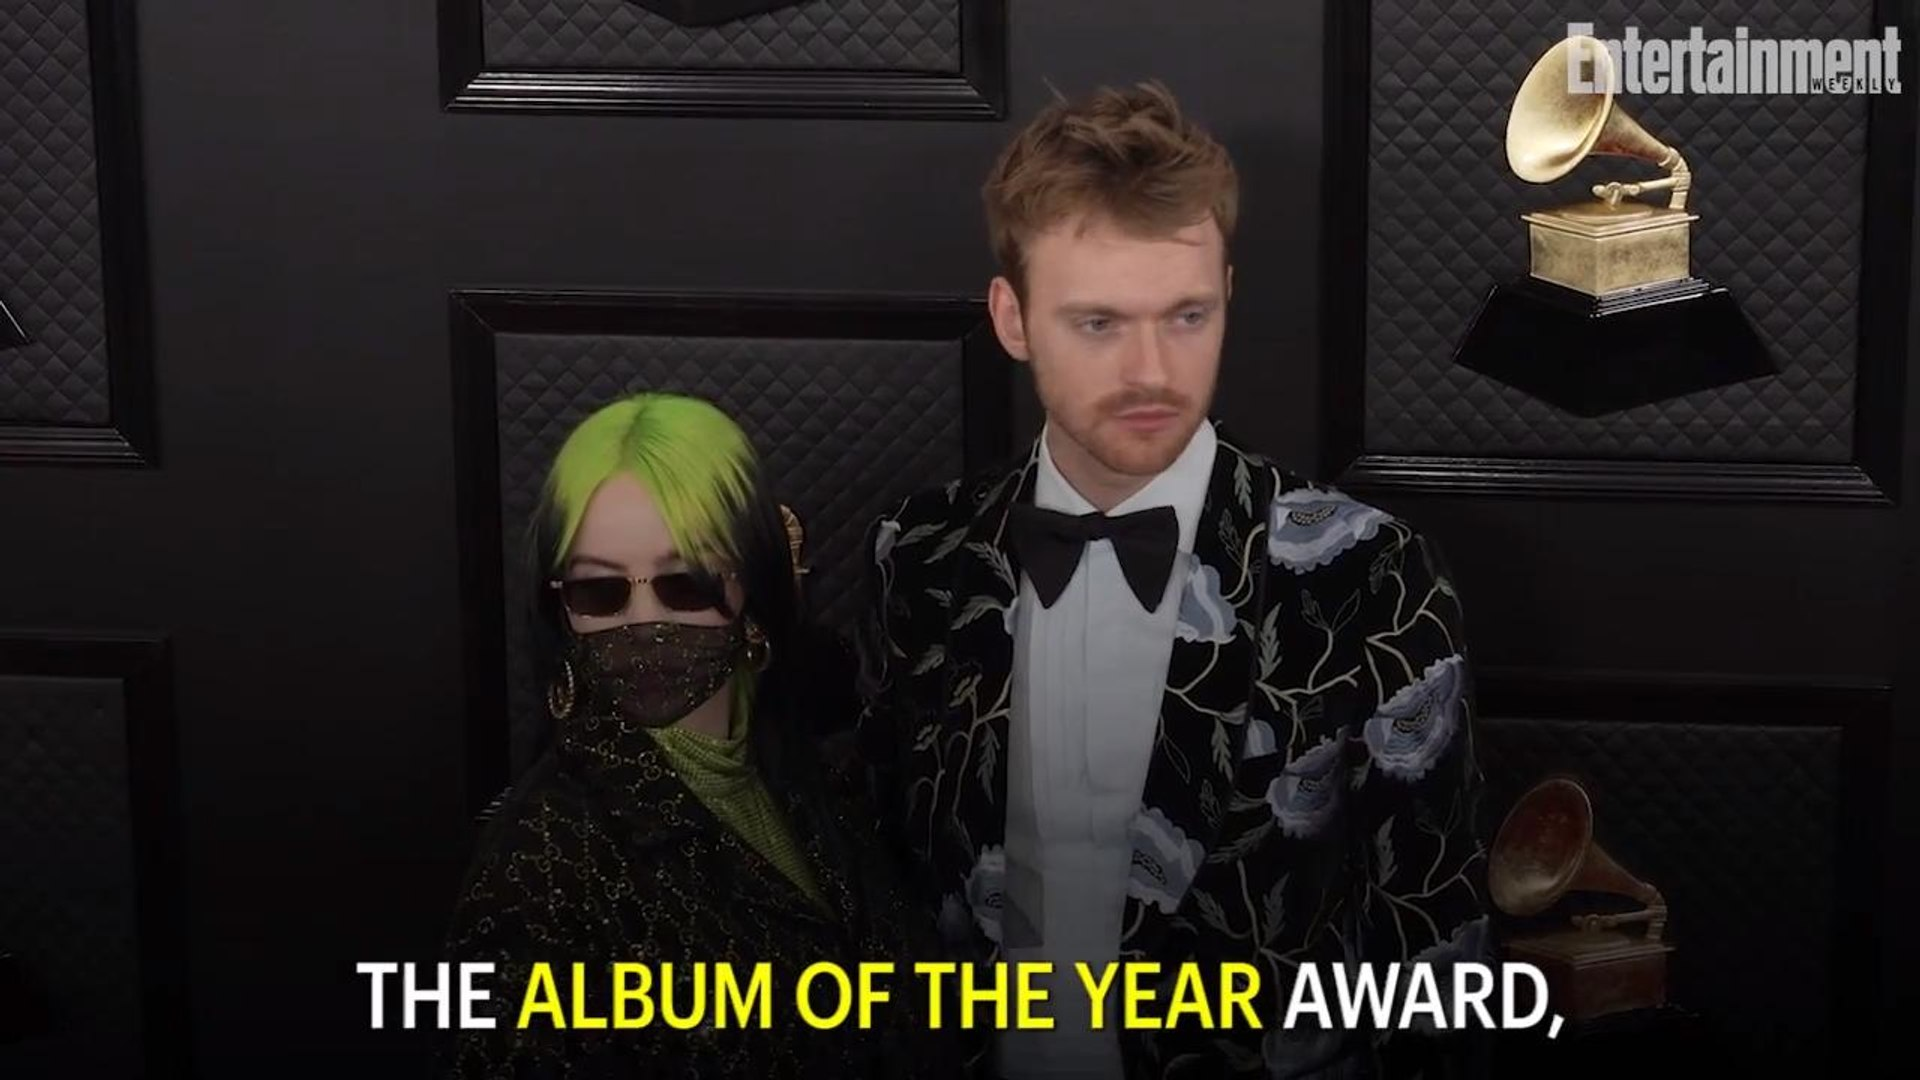 Grammy Awards 2020: Billie Eilish Sweeps Four Major Categories